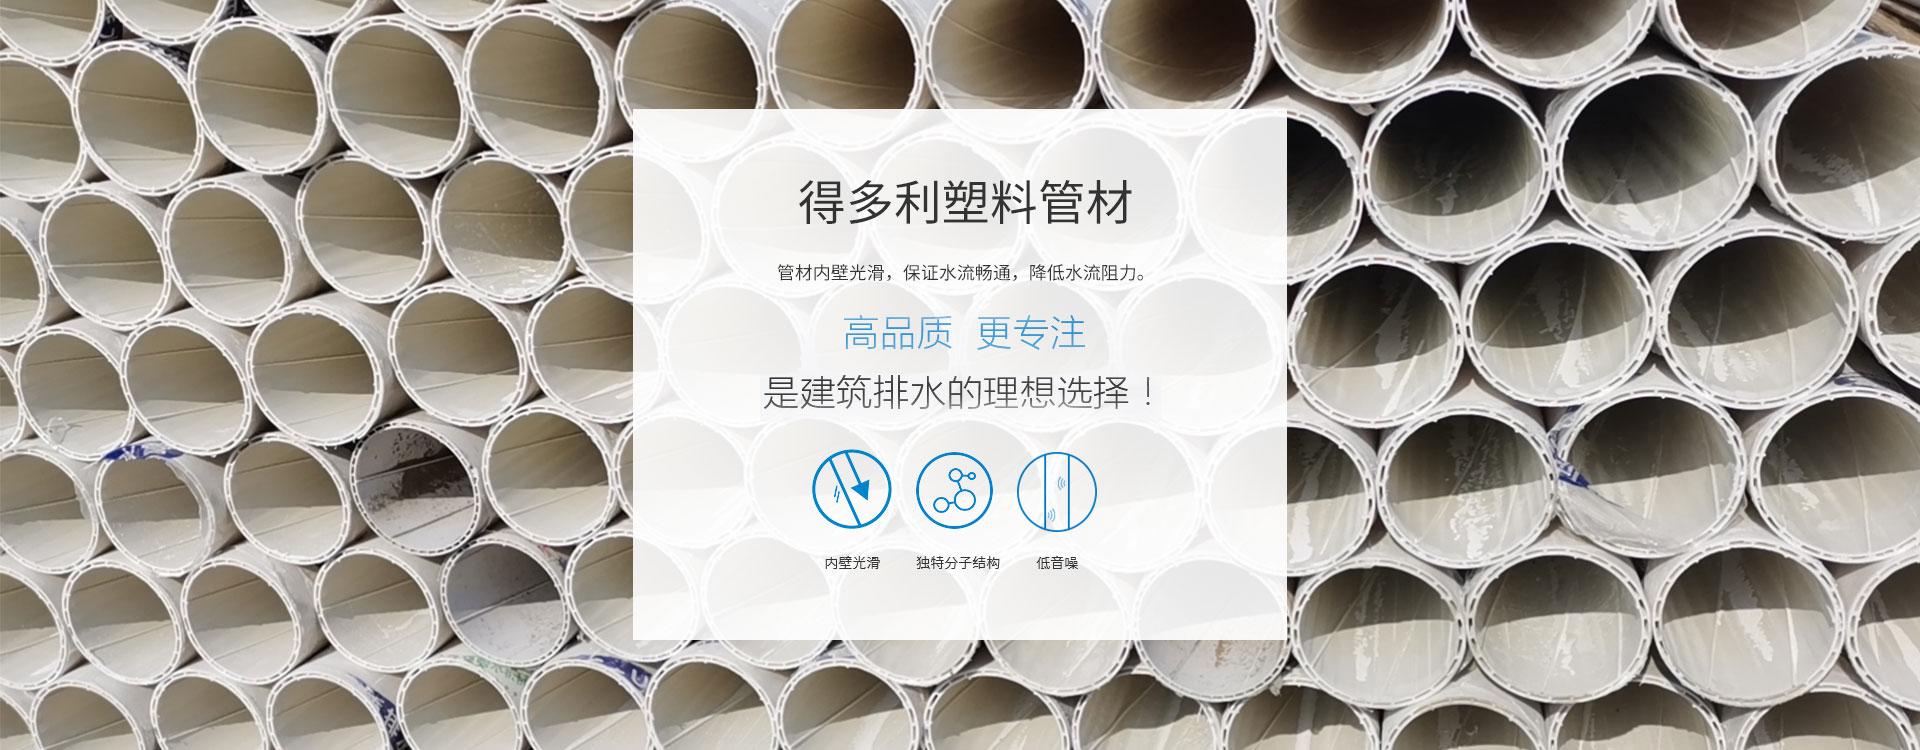 PVC-U給水管道的產品特性